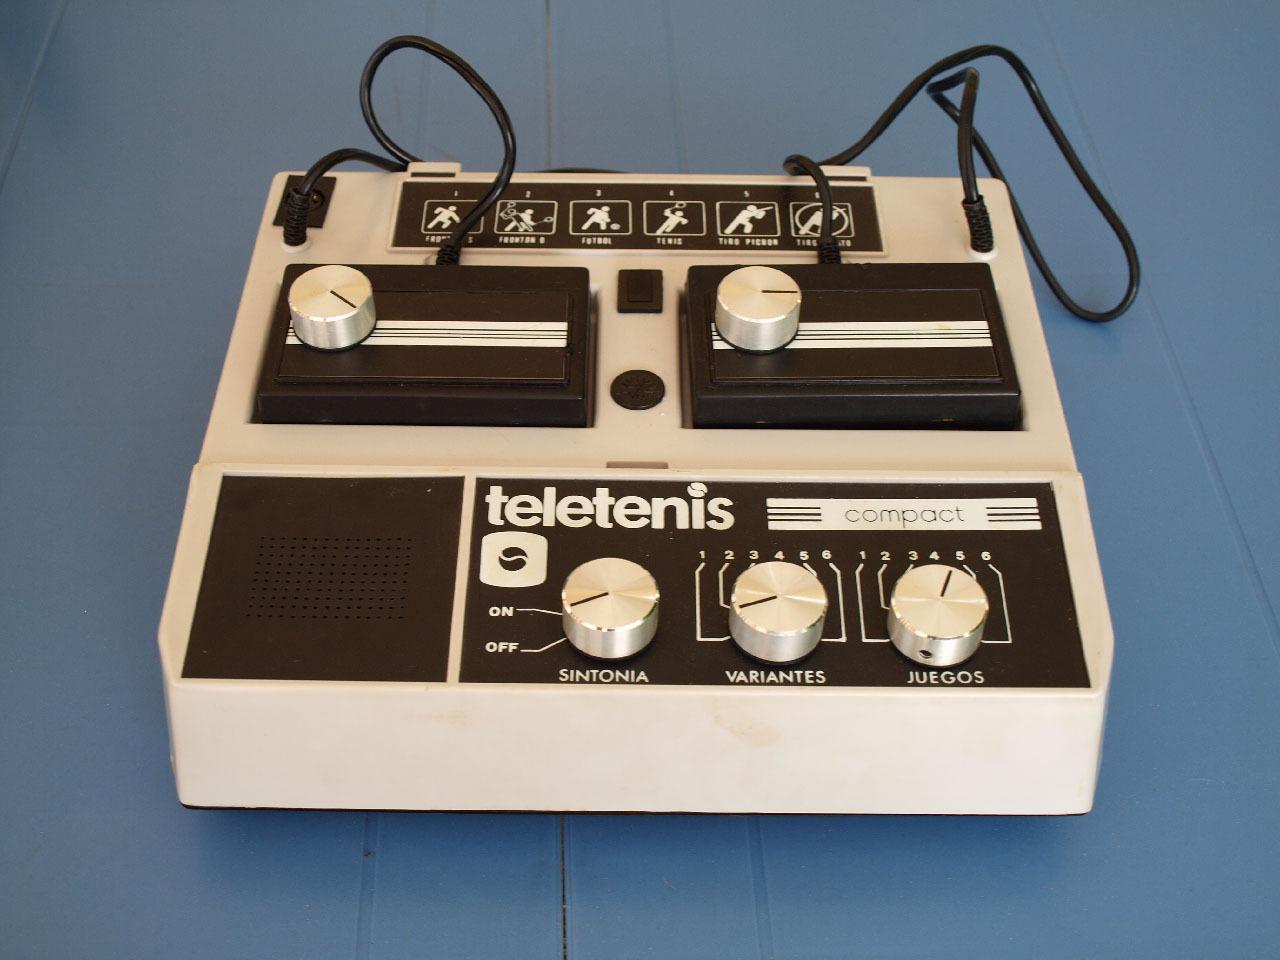 Teletenis Compact, retrounboxing y gameplay 4